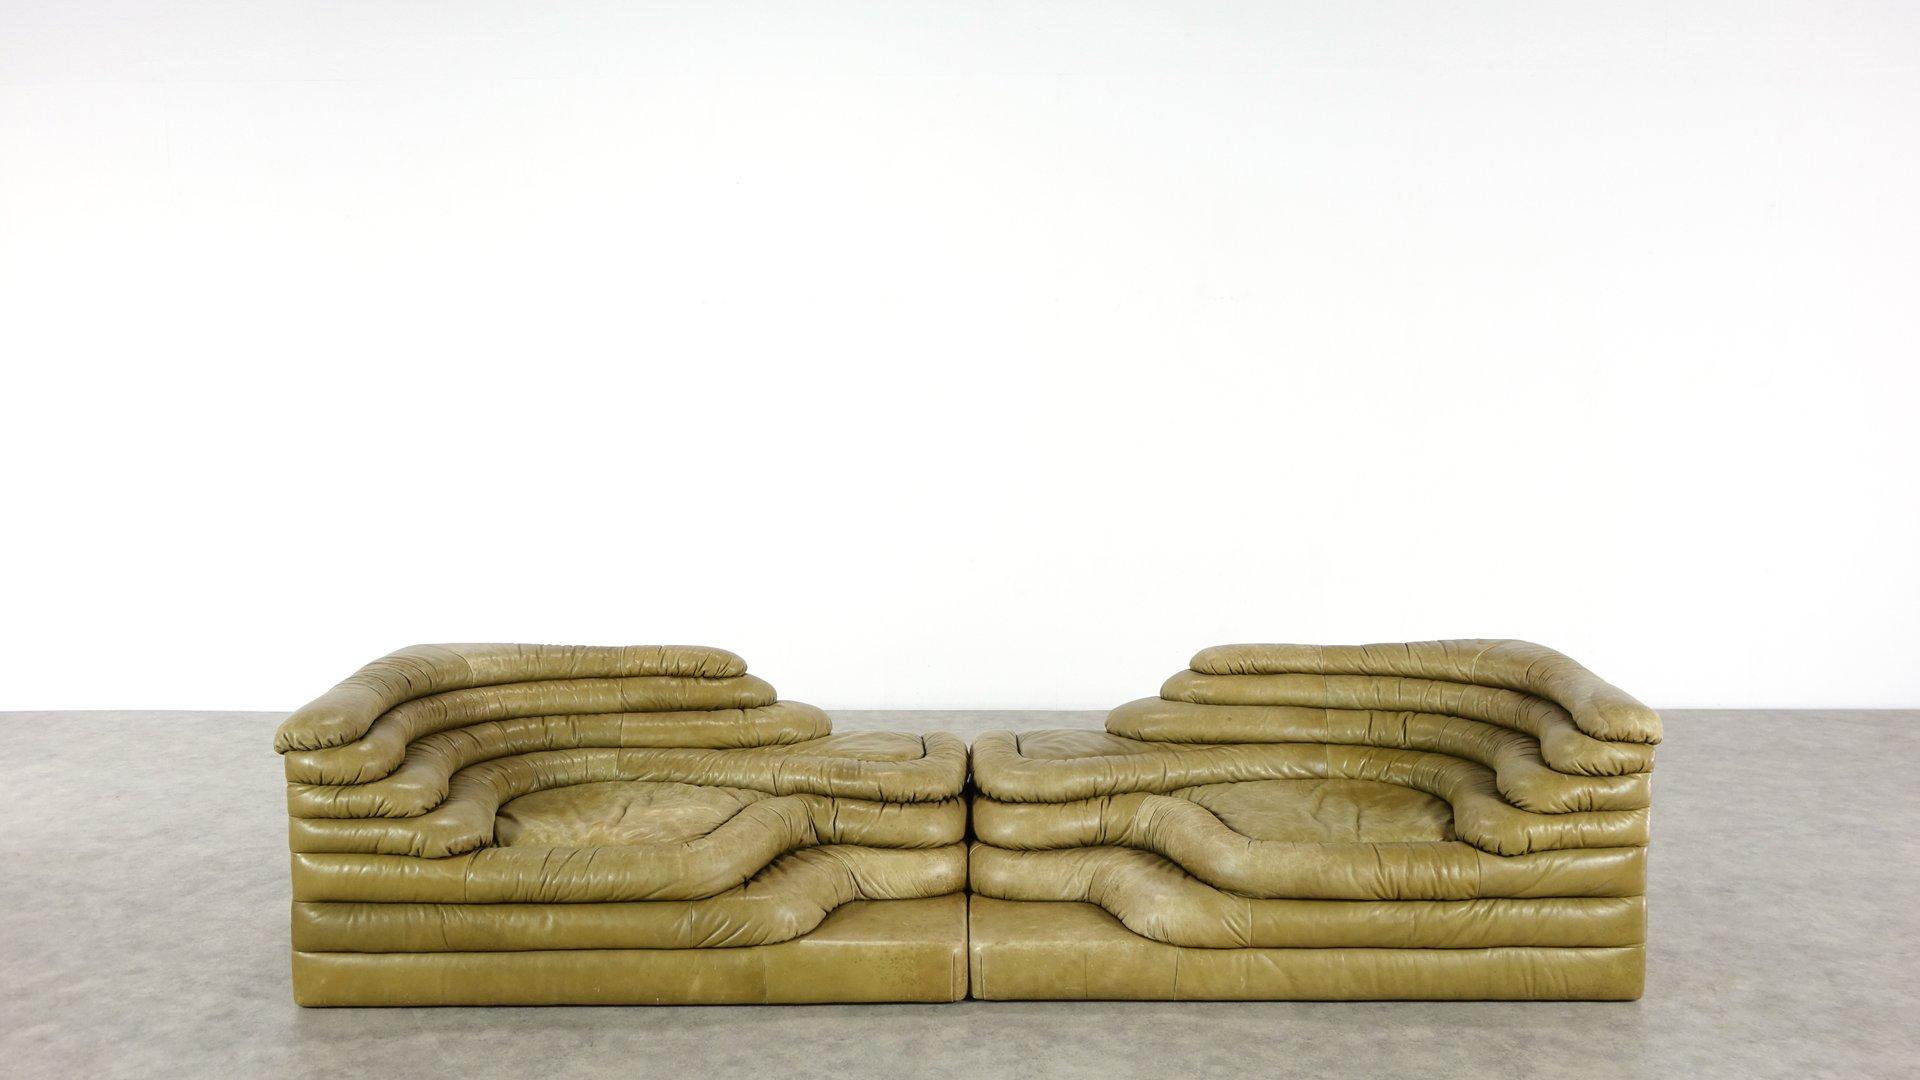 Terrazza Landscape Sofas By Ubald Klug For De Sede 1970s Set Of 2